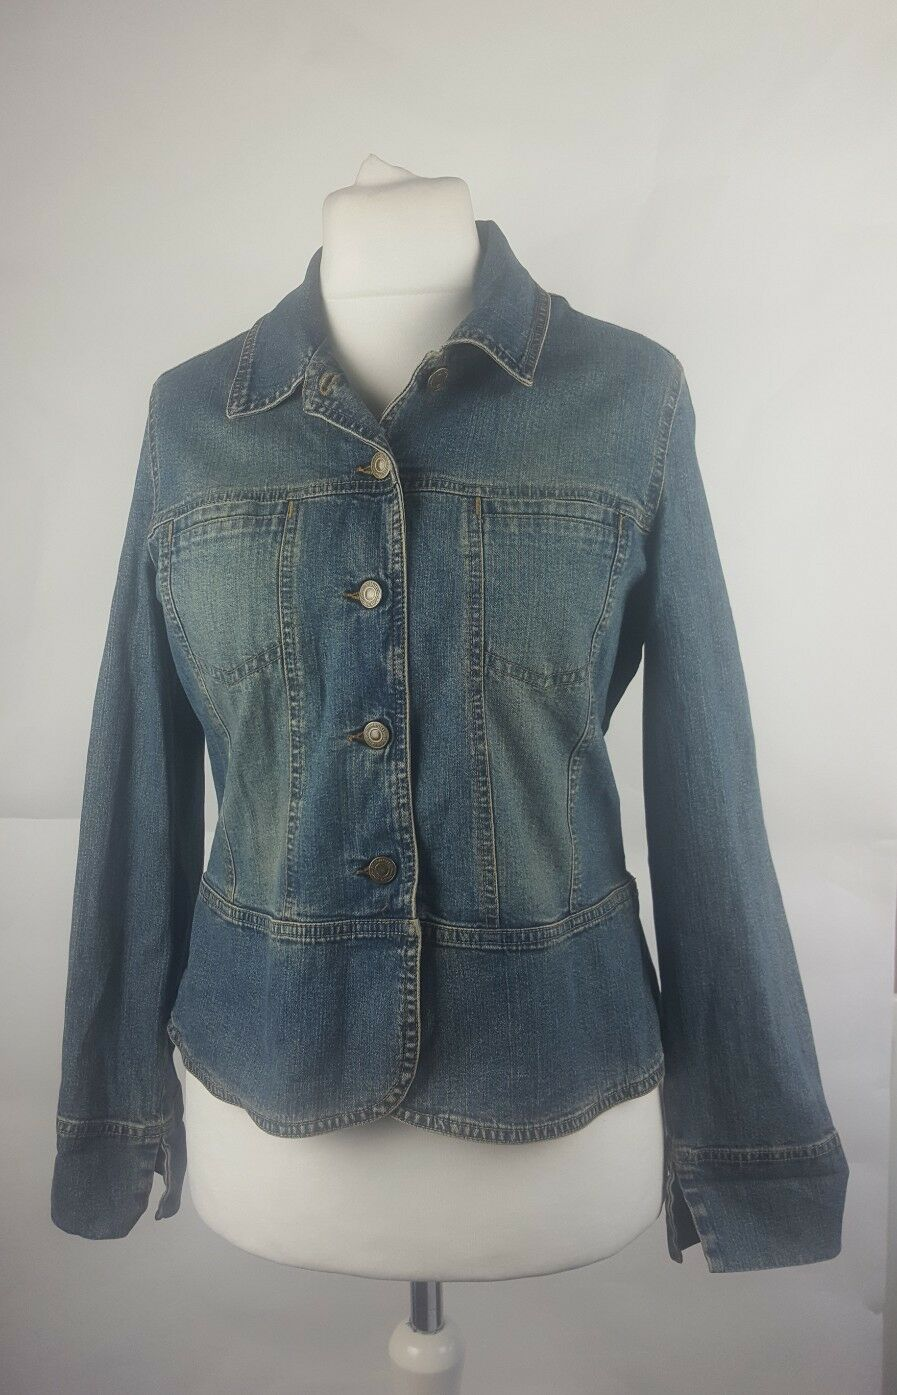 e2d47d1c34bb Femmes Denim Veste Marks Spencer Mix Taille Bleu amp  Jeans qwCHxt4H